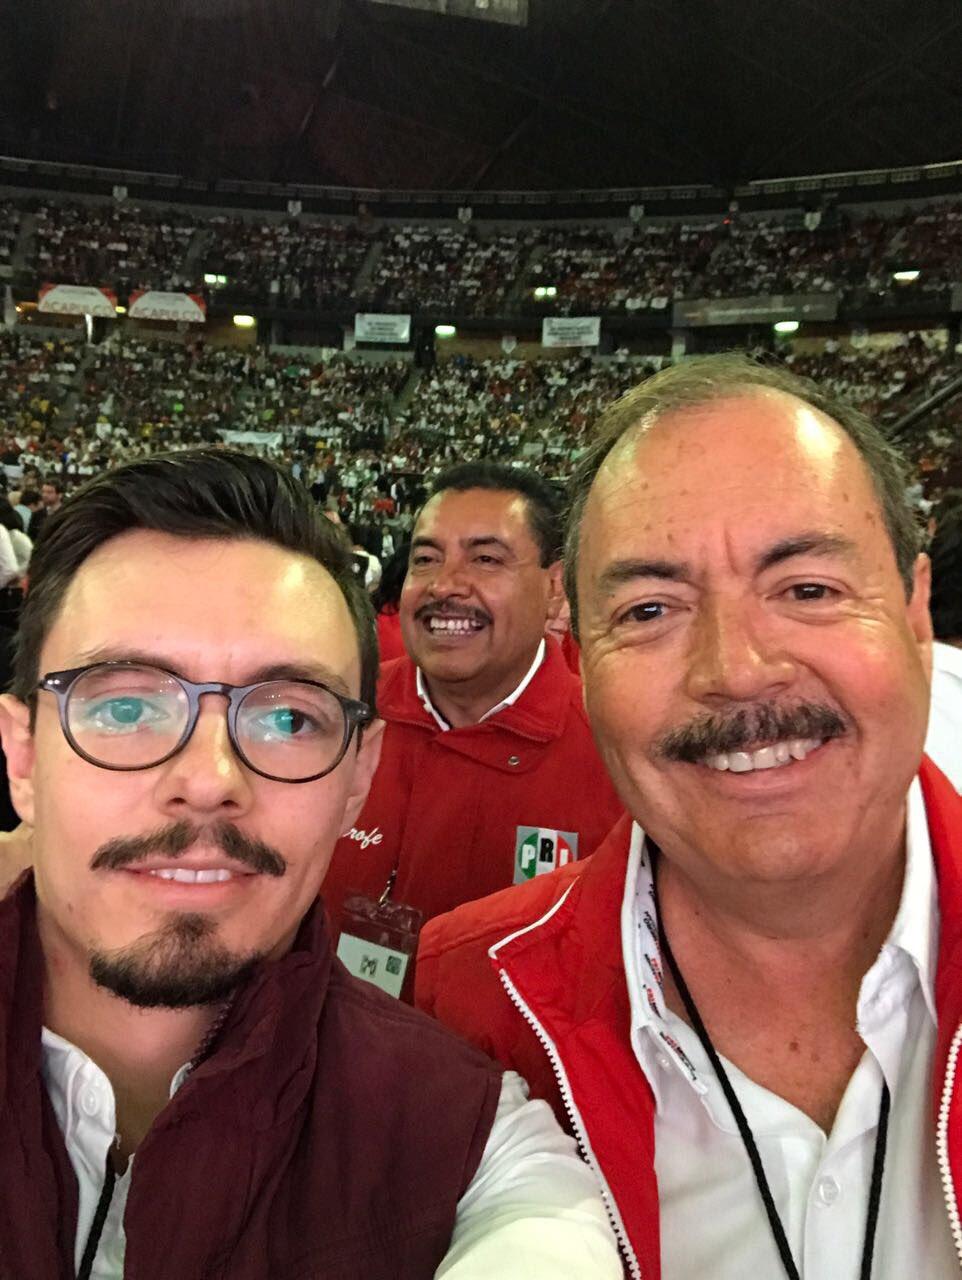 Listos con Víctor para celebrar nuestra #XXIIAsambleaPRI #TuVozEsPRImero! https://t.co/uV6ZILbPyp